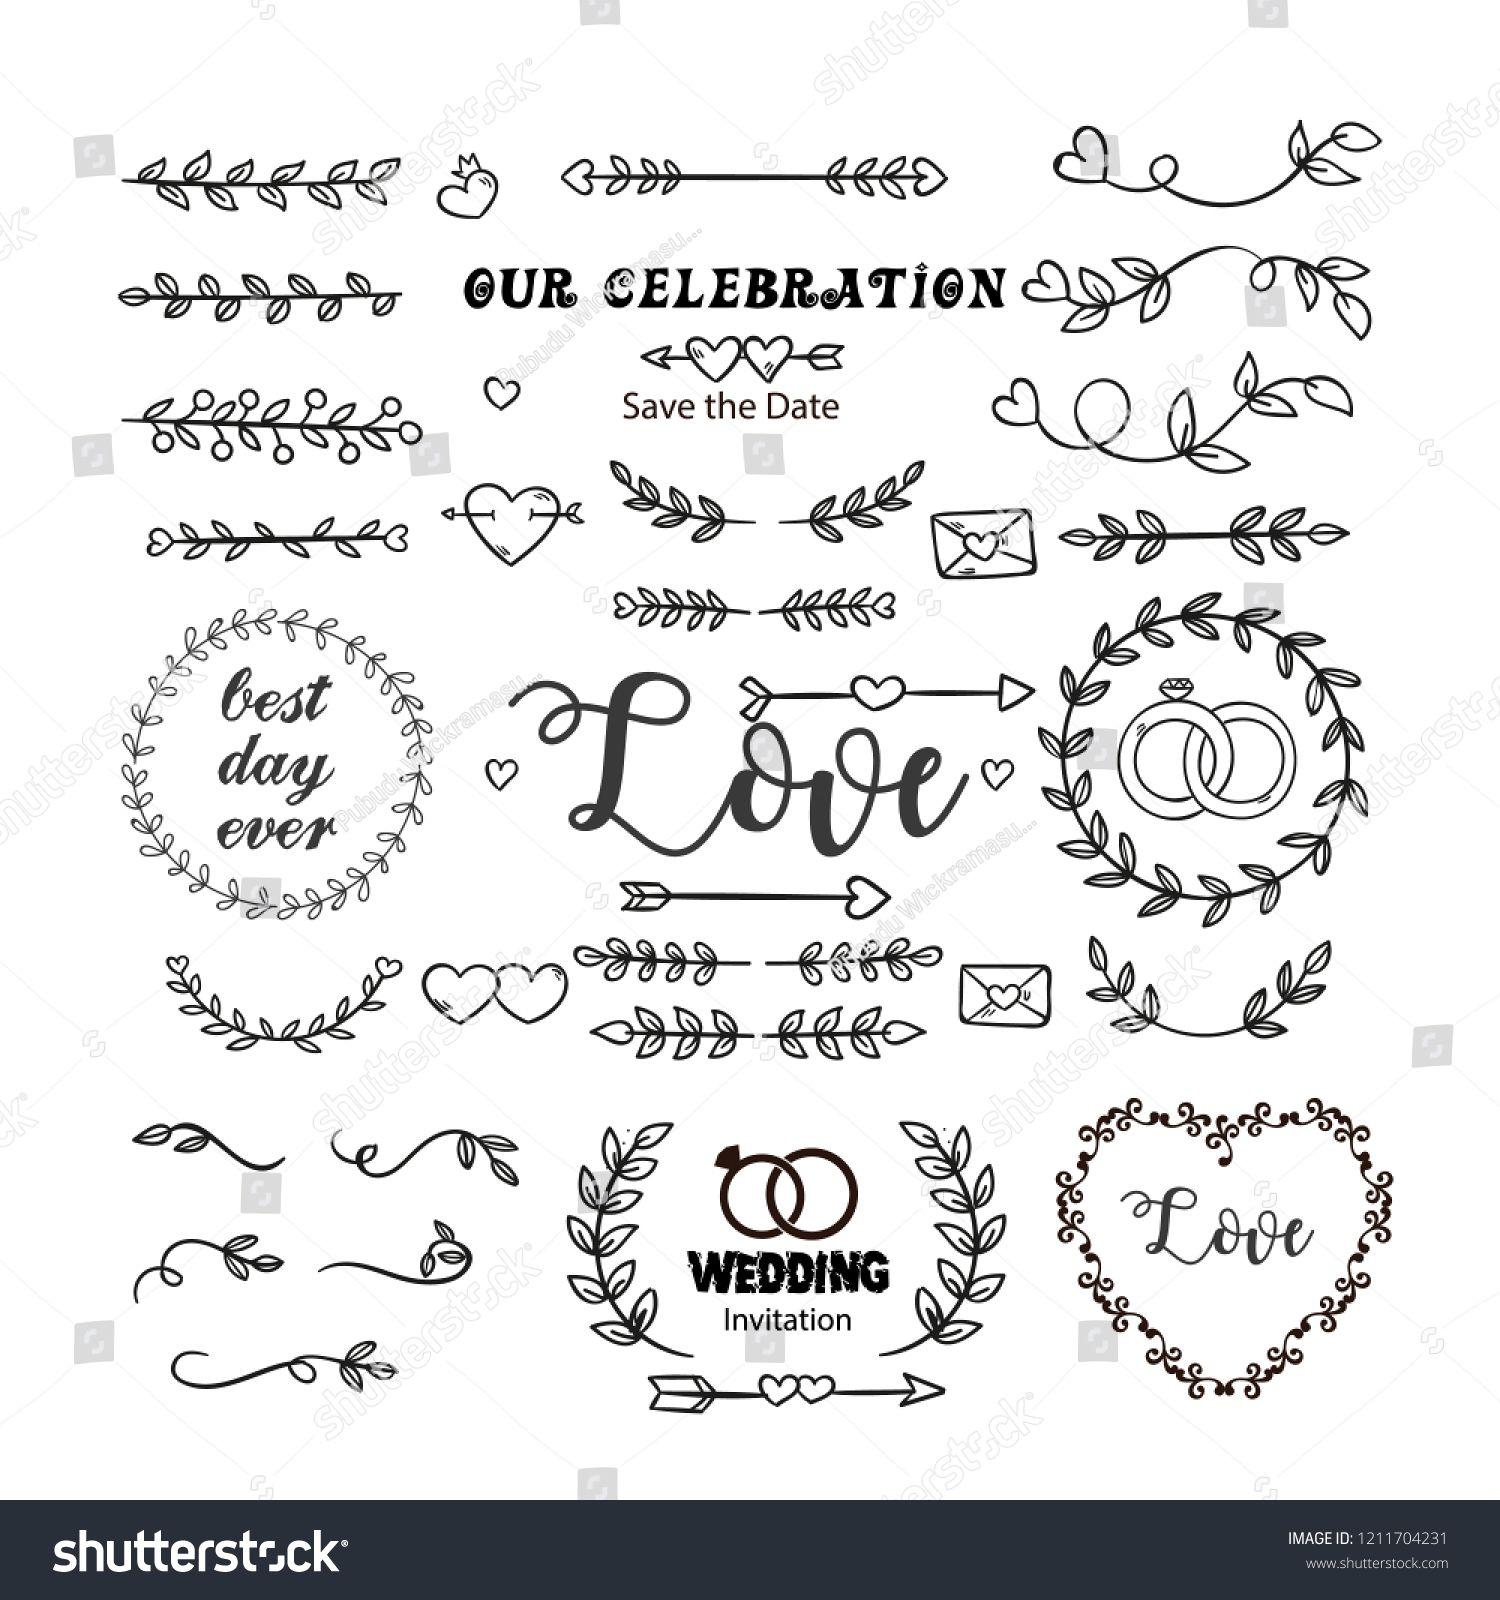 Hand Drawn Wedding Ornaments Abstract Vector Icon Set Wedding Ornaments Hand Drawn Hand Drawn Wedding Icon Set Vector Icon Set